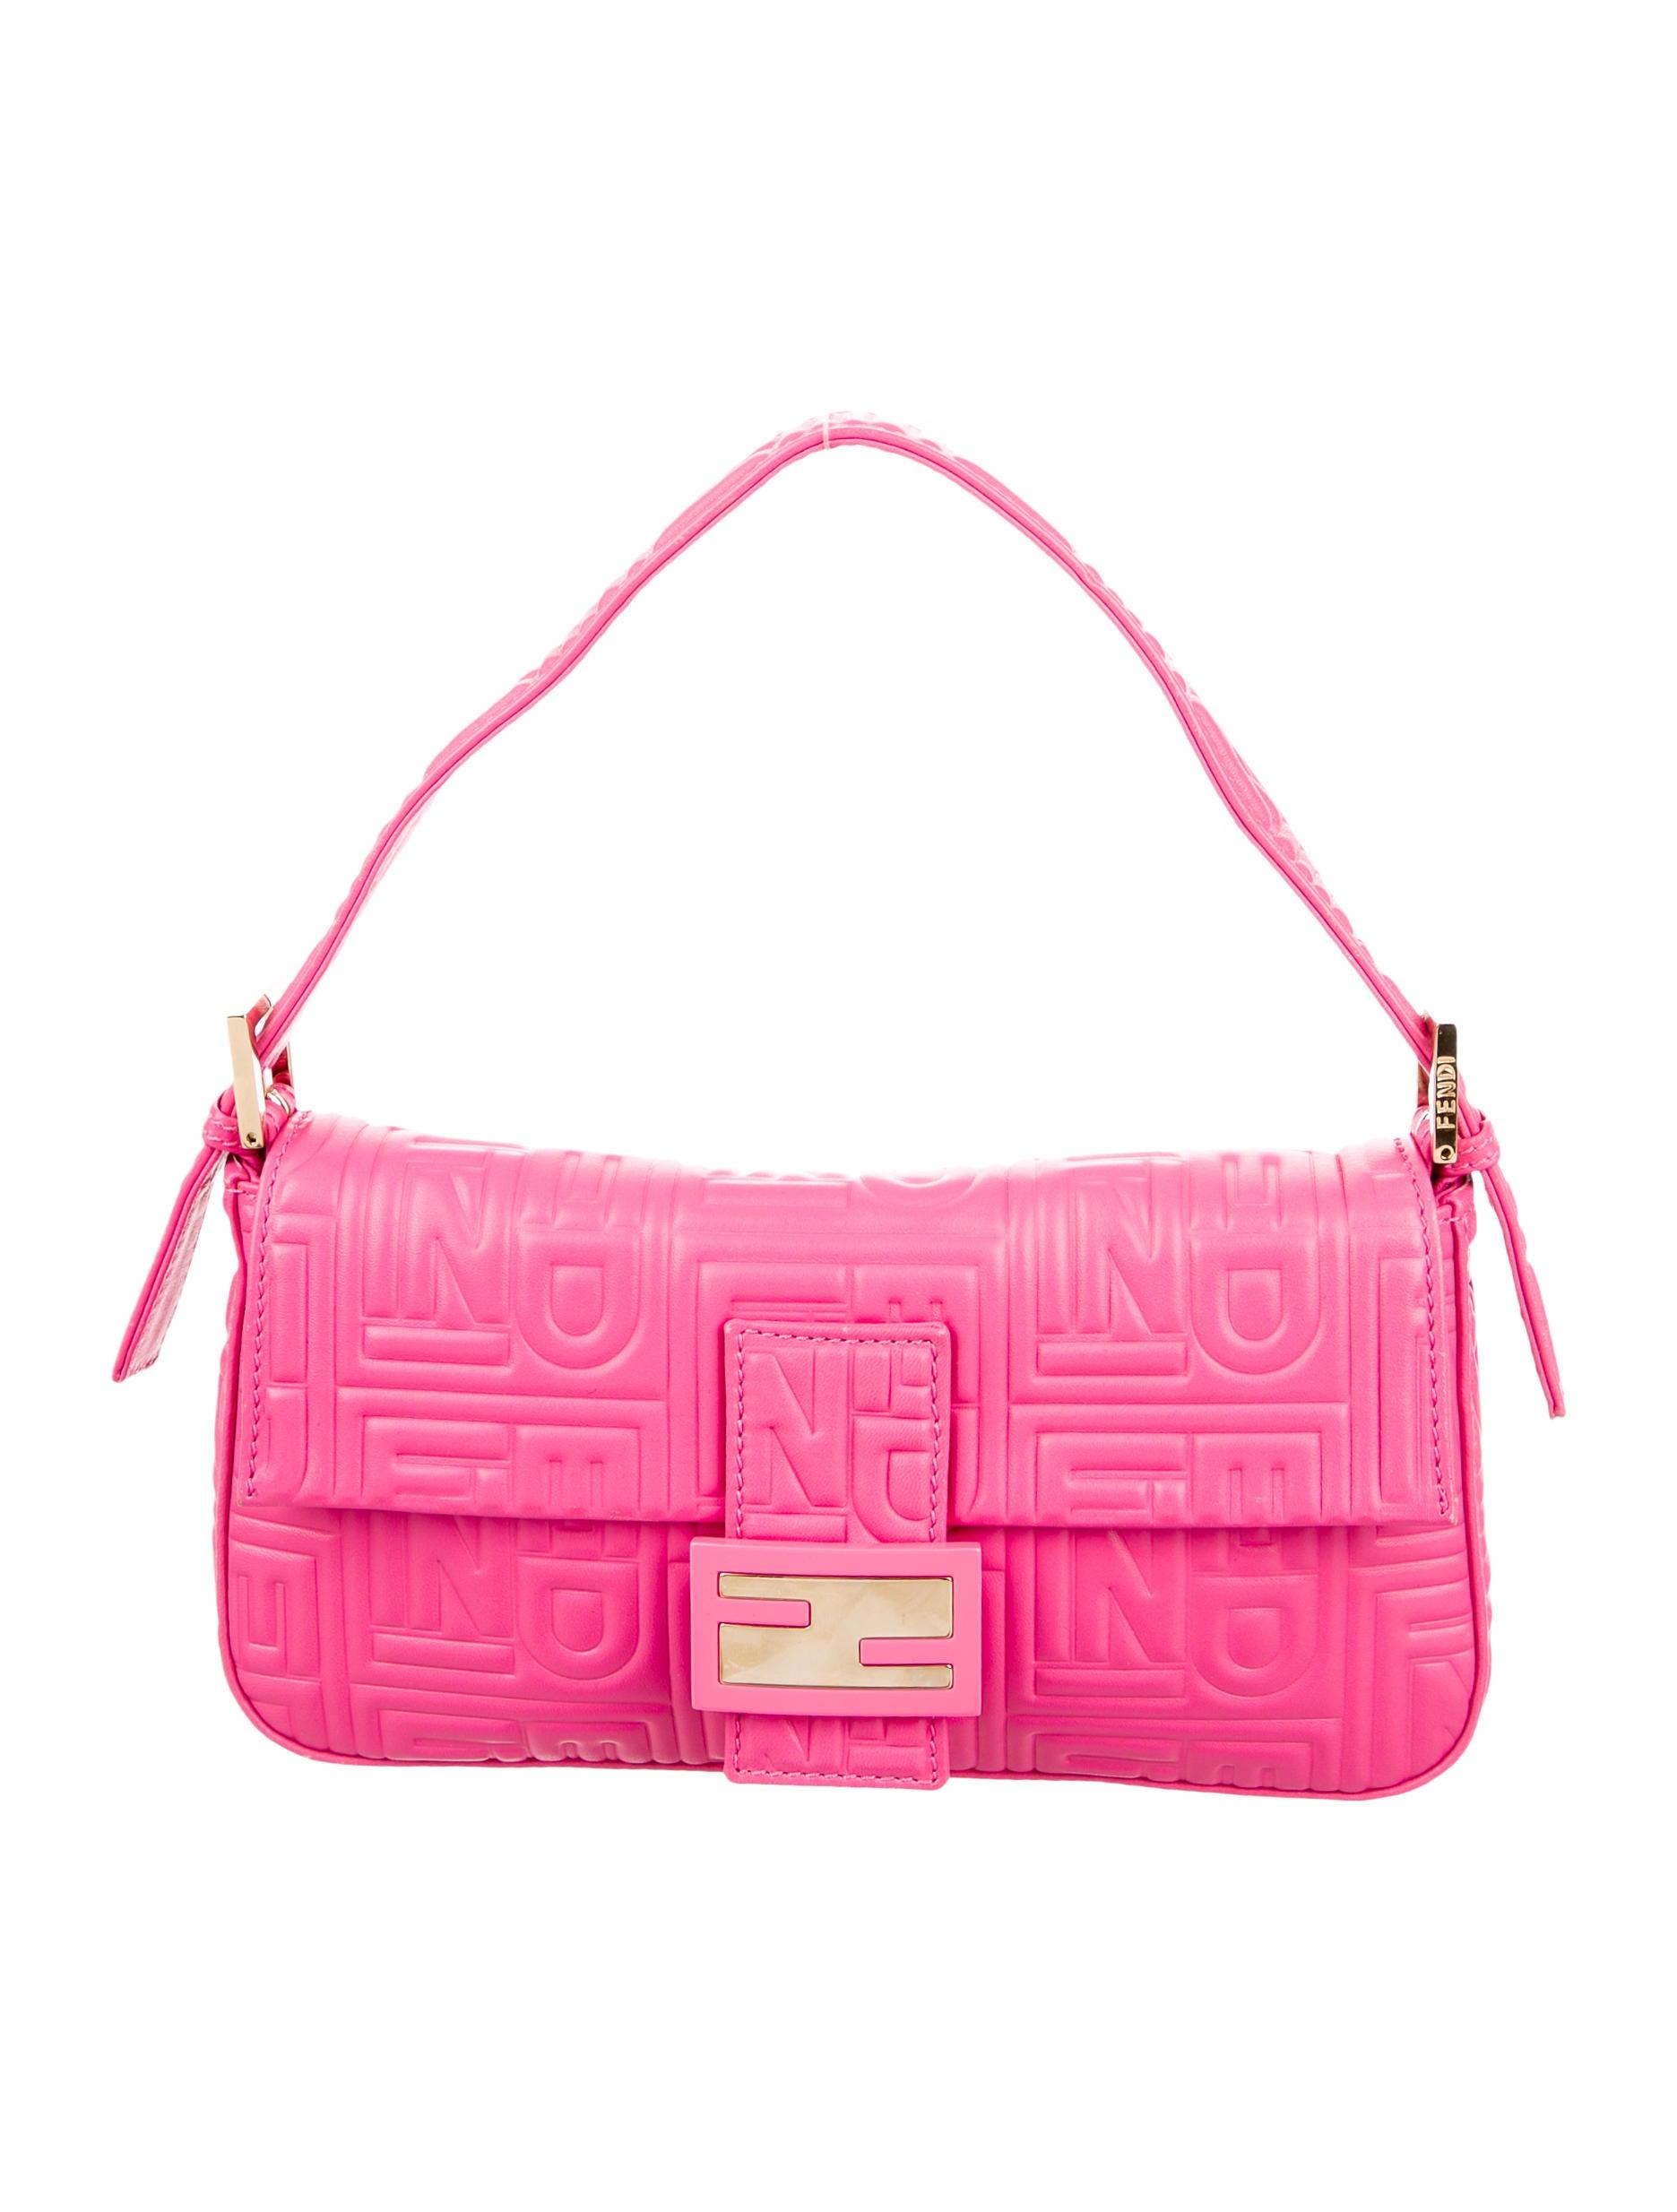 e4c9ba0f30 Fendi Embossed Nappa Leather Baguette - Handbags - FEN55274 | The ...